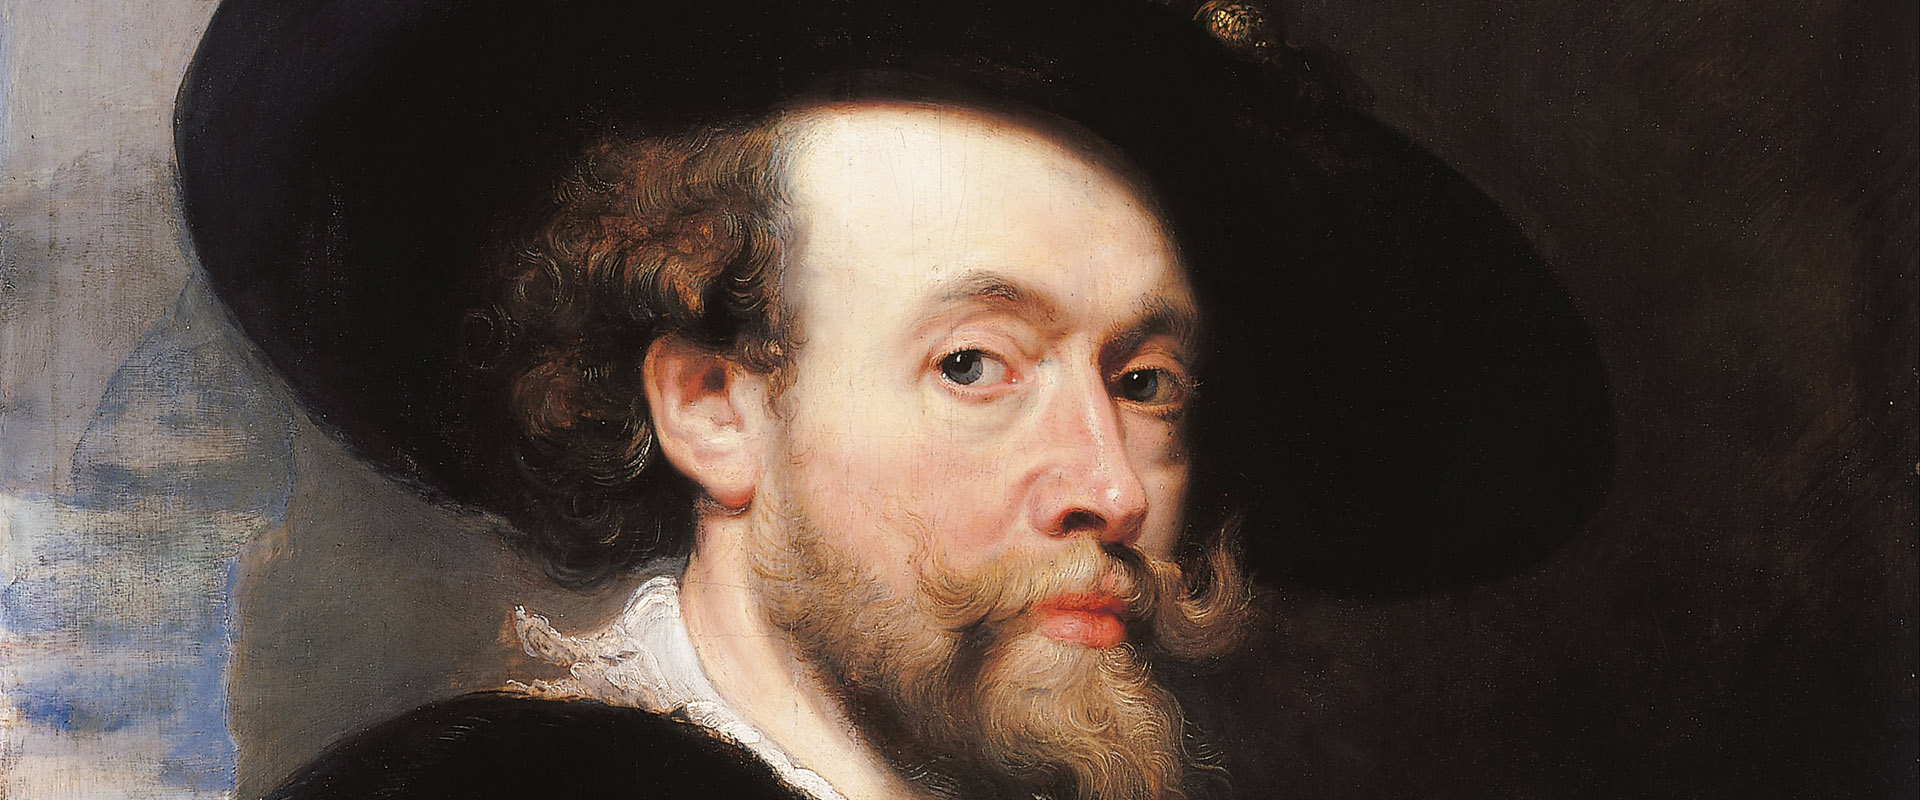 Sir_Peter_Paul_Rubens_-_Portrait_of_the_Artist_-_Google_Art_Project